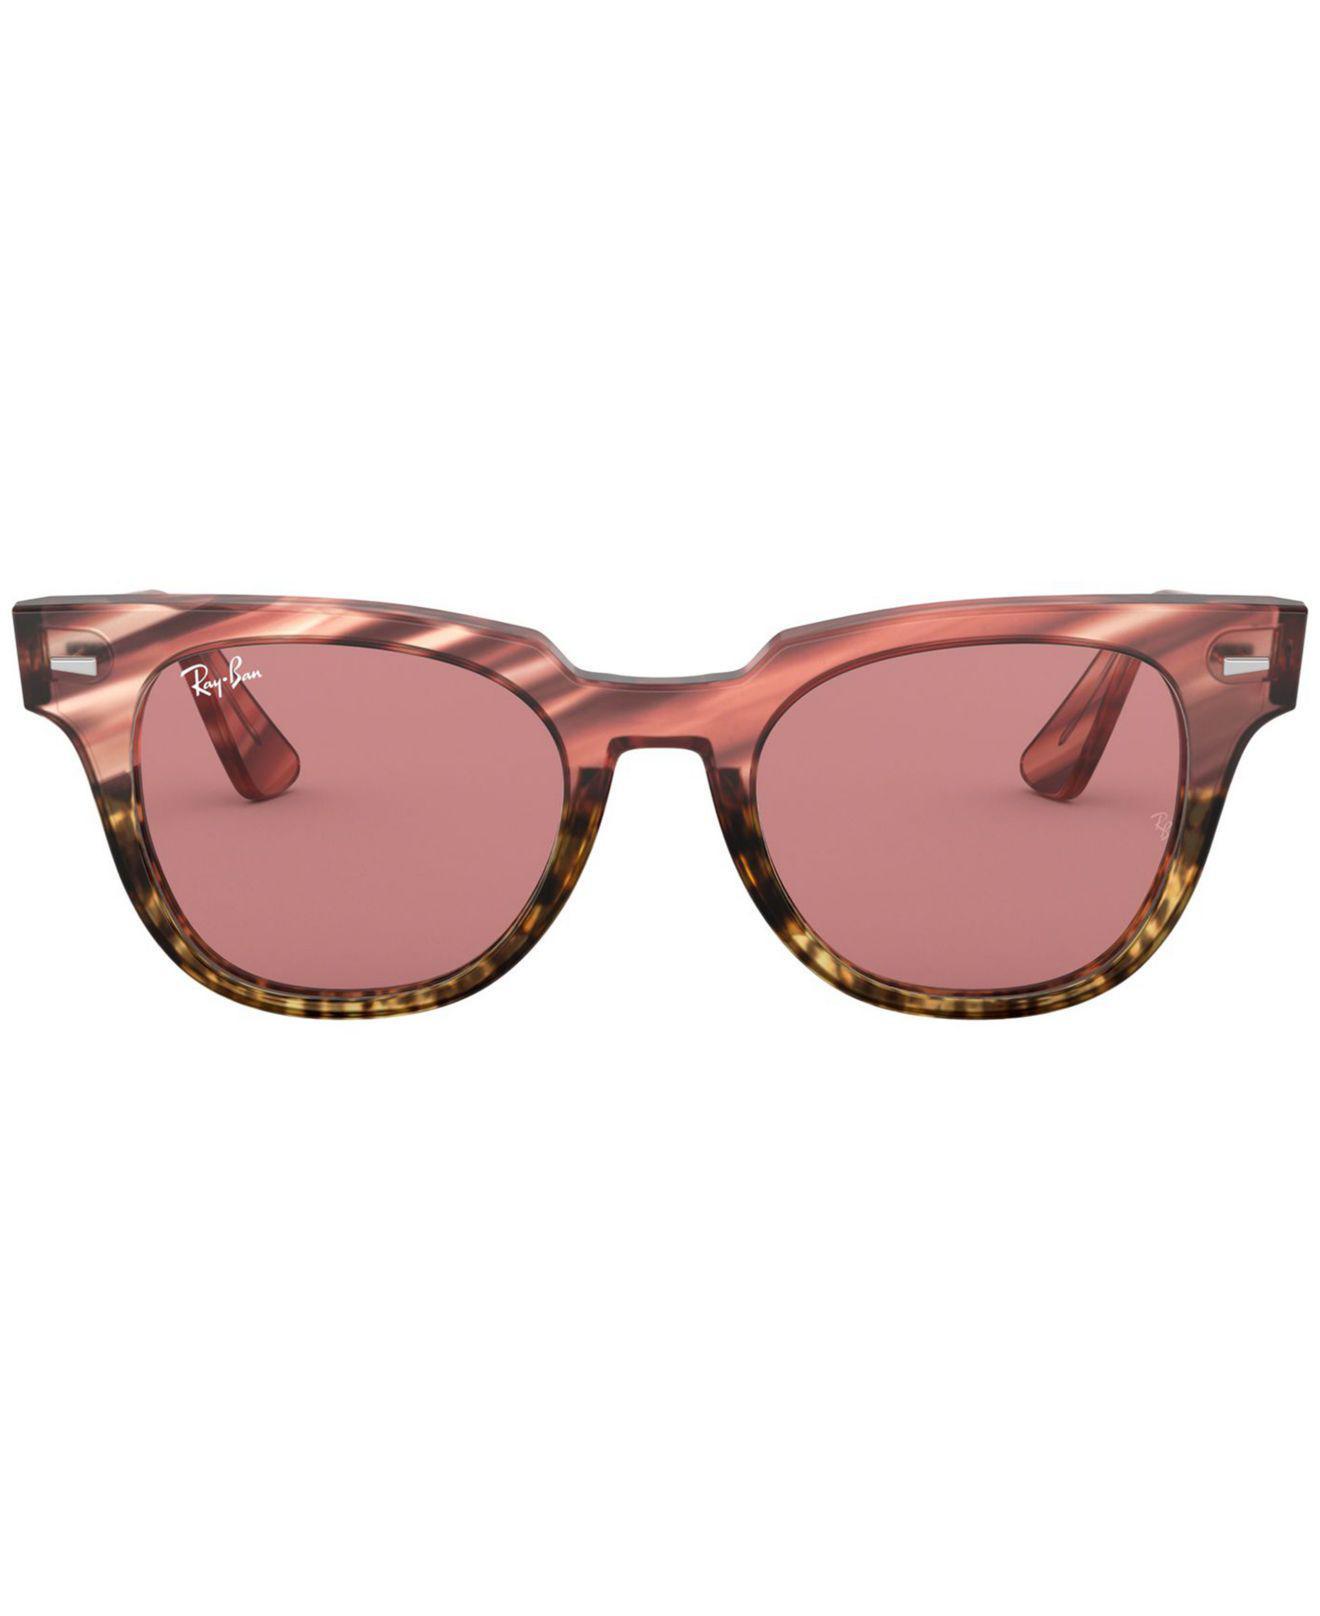 36566fb057 ... aliexpress lyst ray ban sunglasses rb2168 50 0bf2c 30946